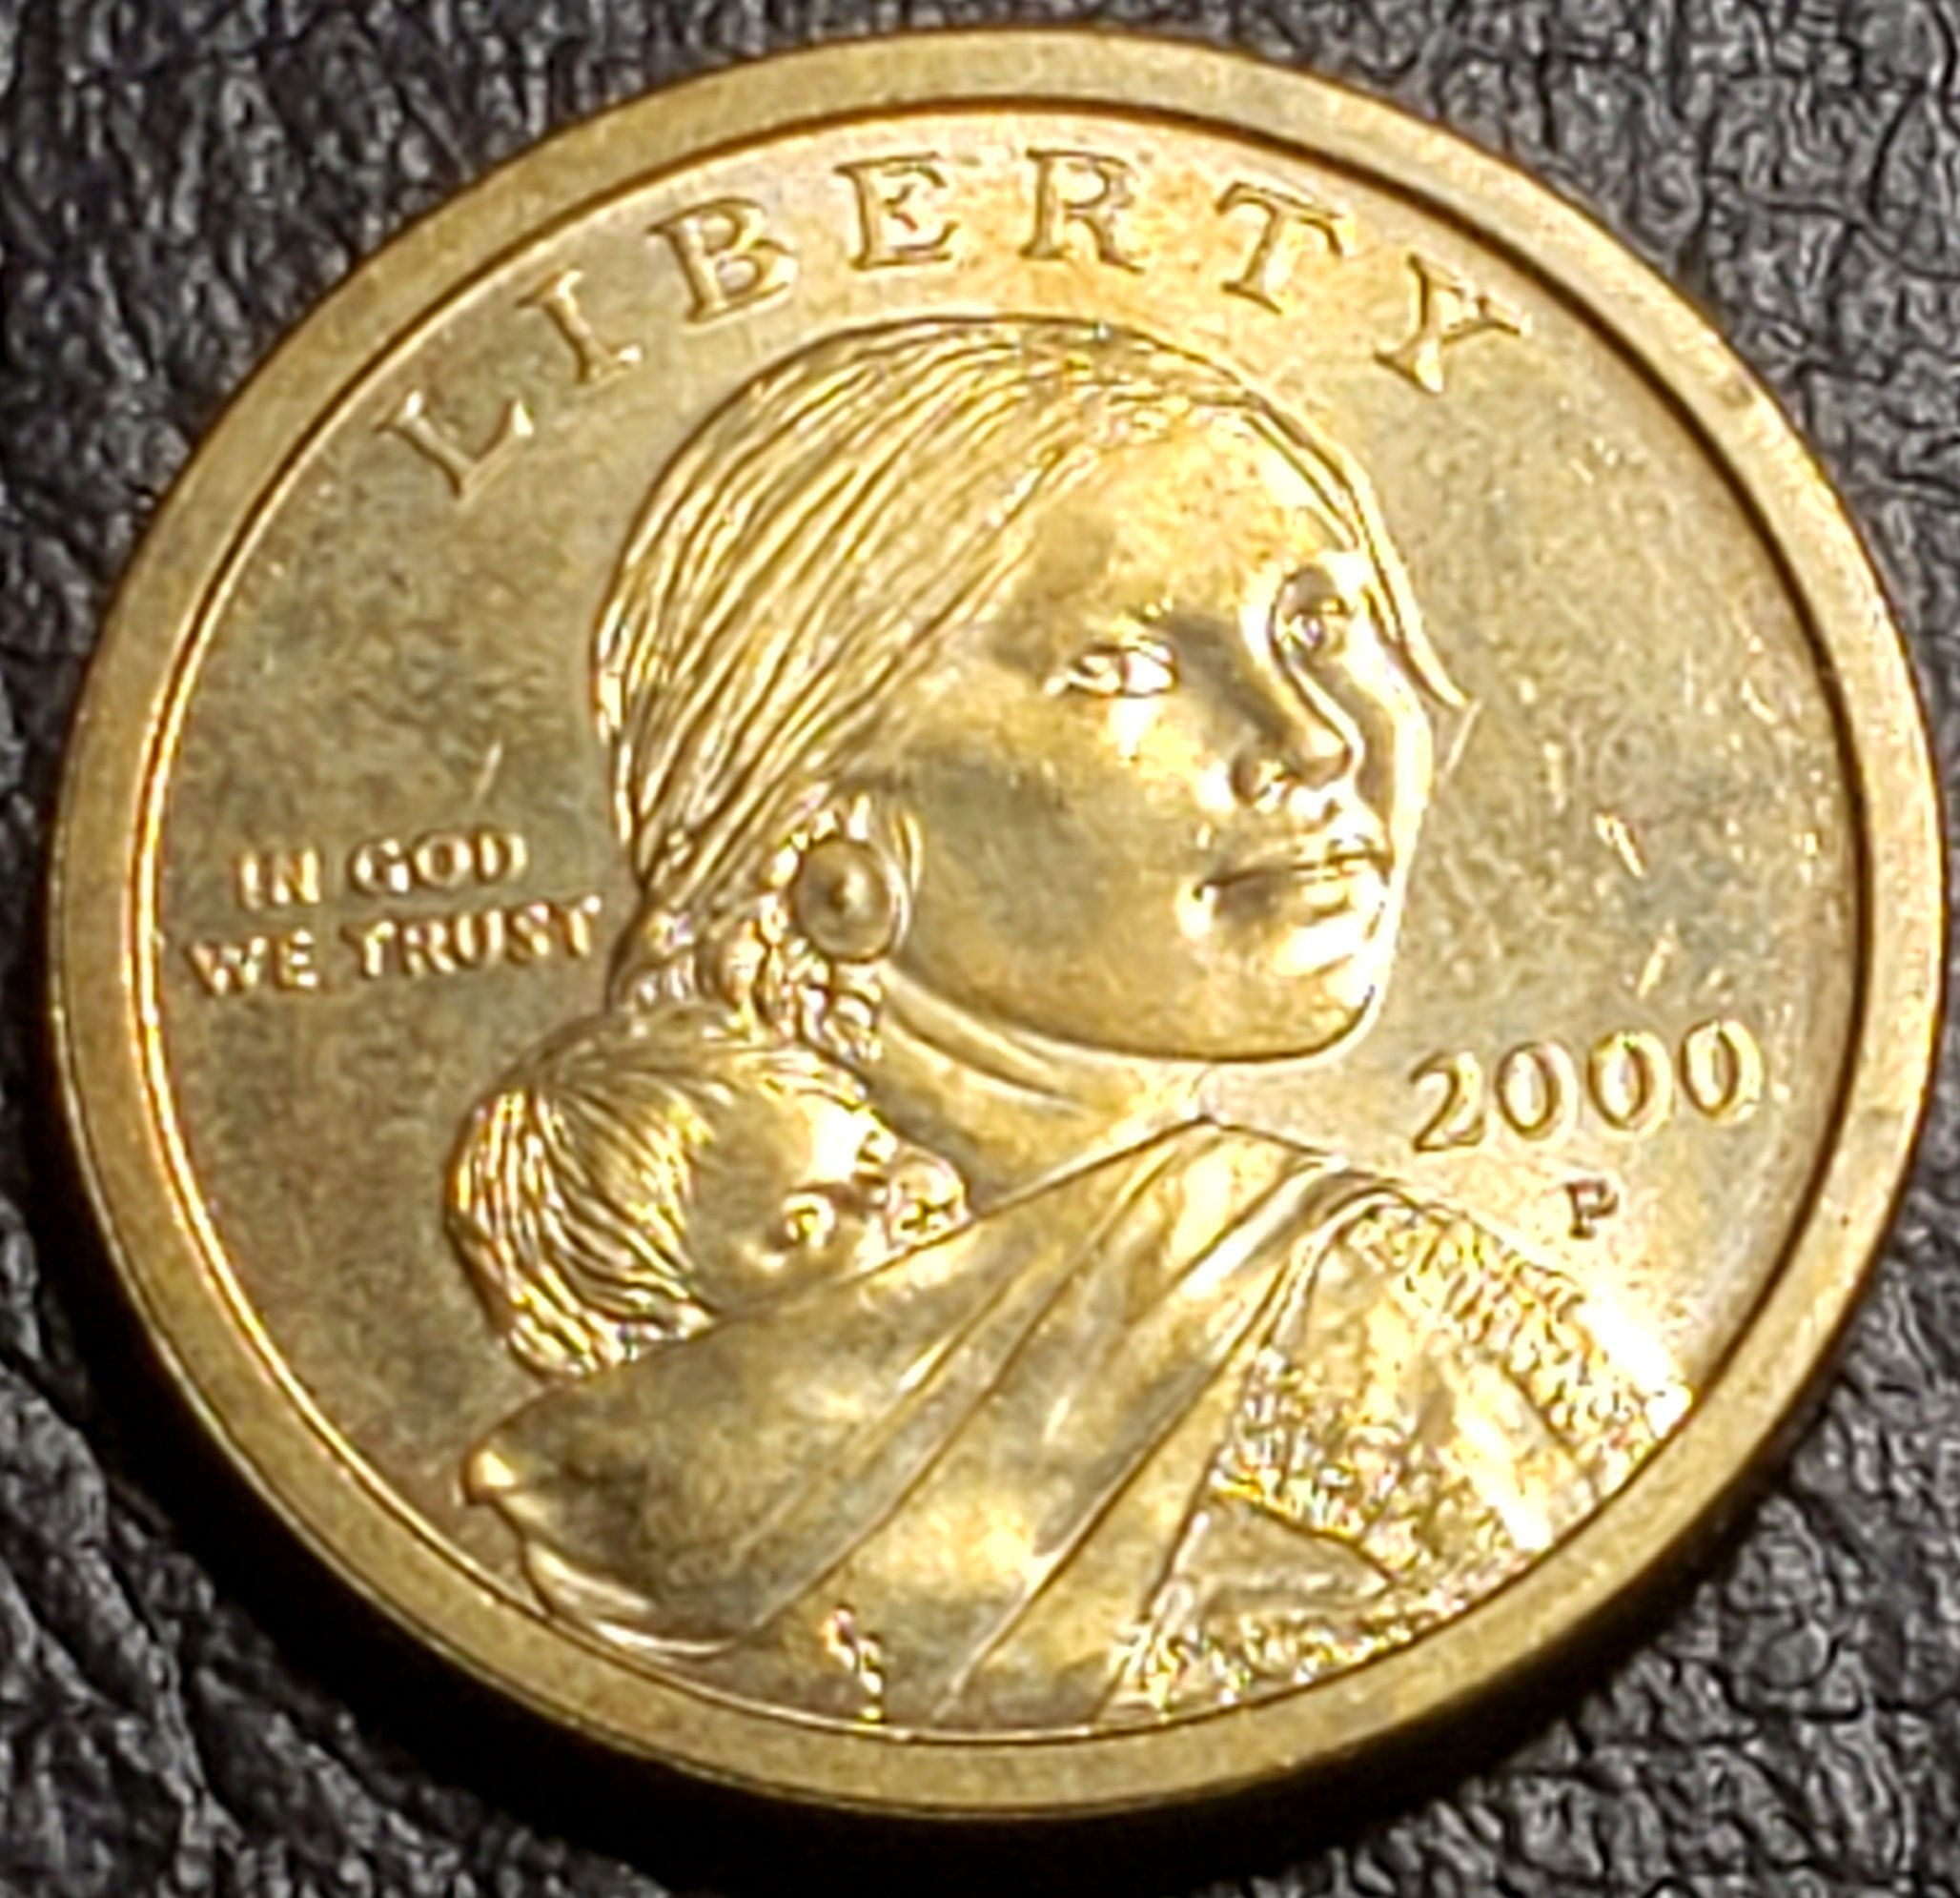 Vintage Dollar Sacagawea Dollarcopper Coin Etsy In 2020 Gold Coins Sacagawea Dollar Copper Coins